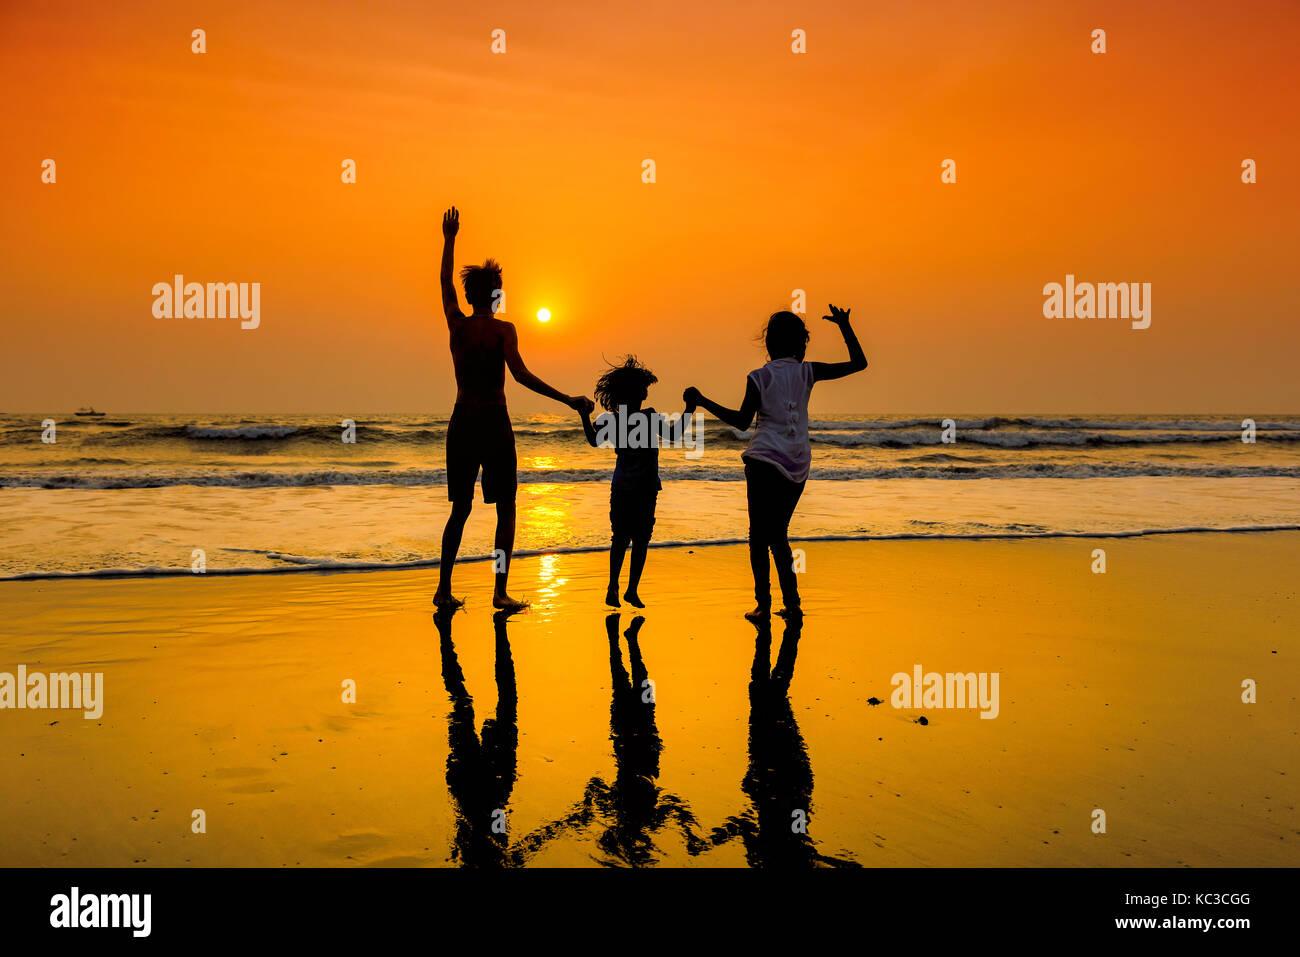 Silhouetten der Gruppe der Kinder tanzen am Strand bei Sonnenuntergang. Stockbild